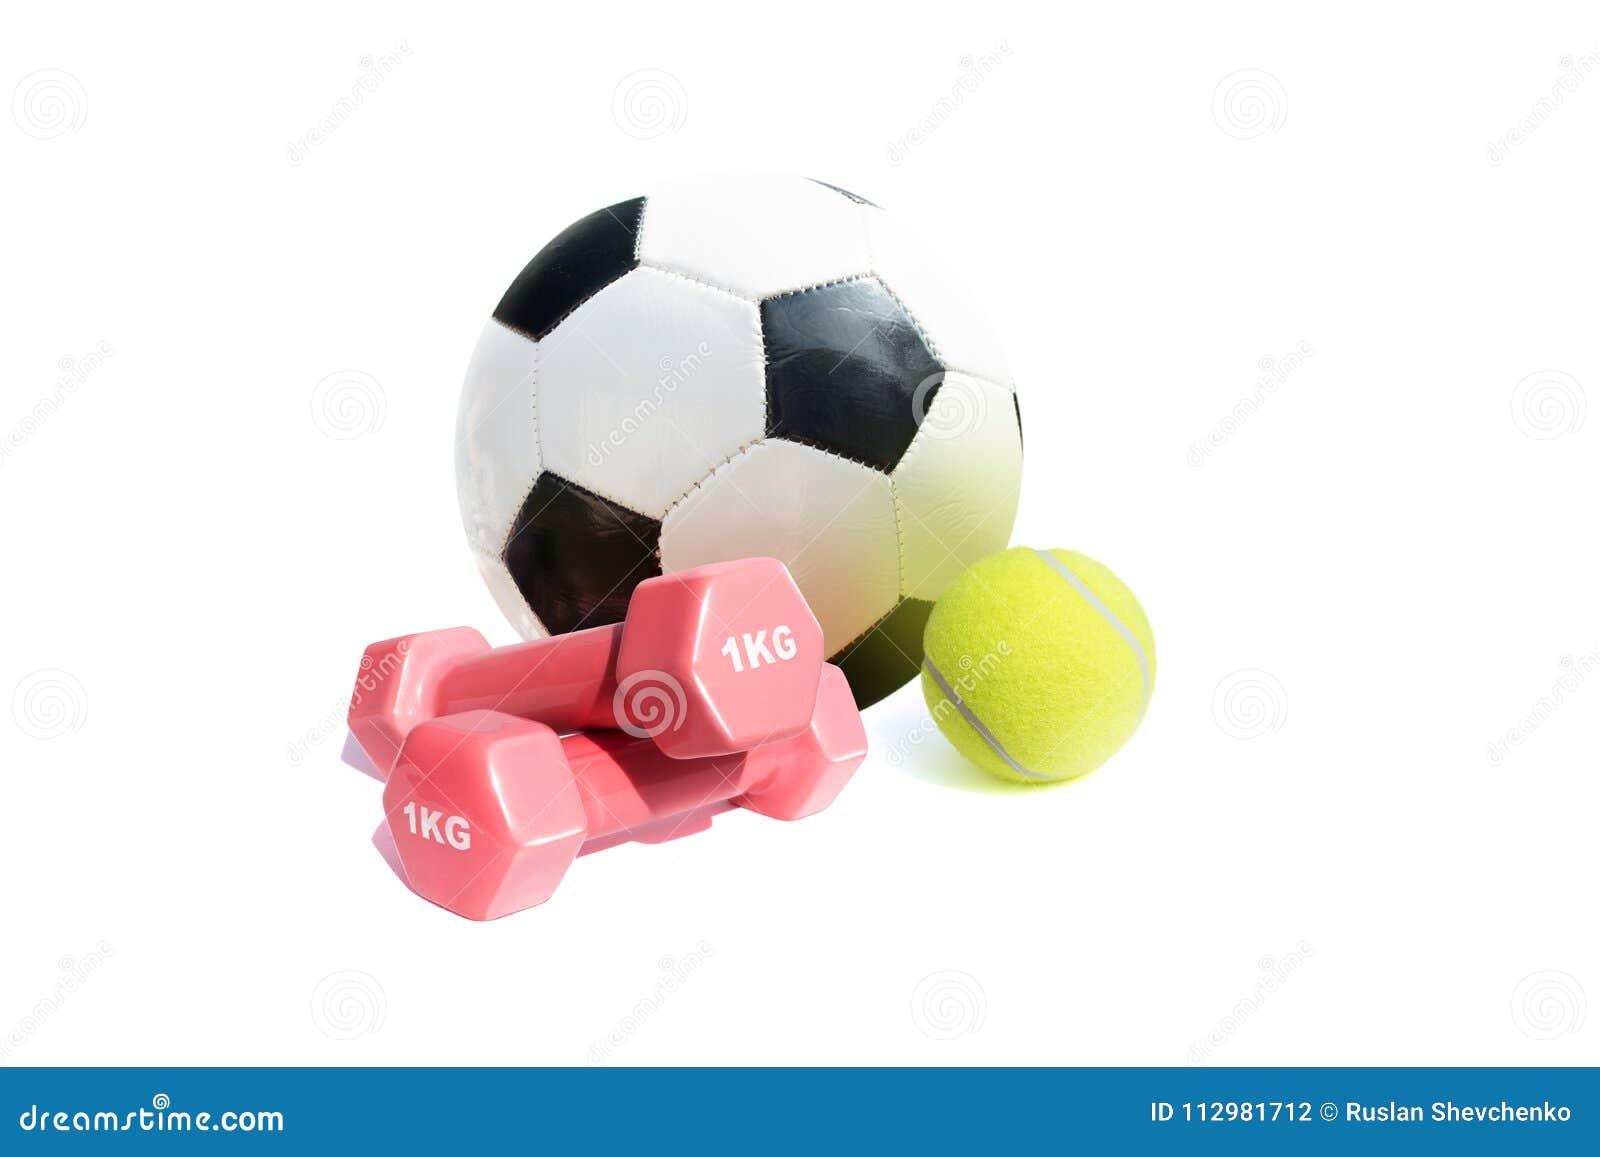 Sport equipment isolate on white background